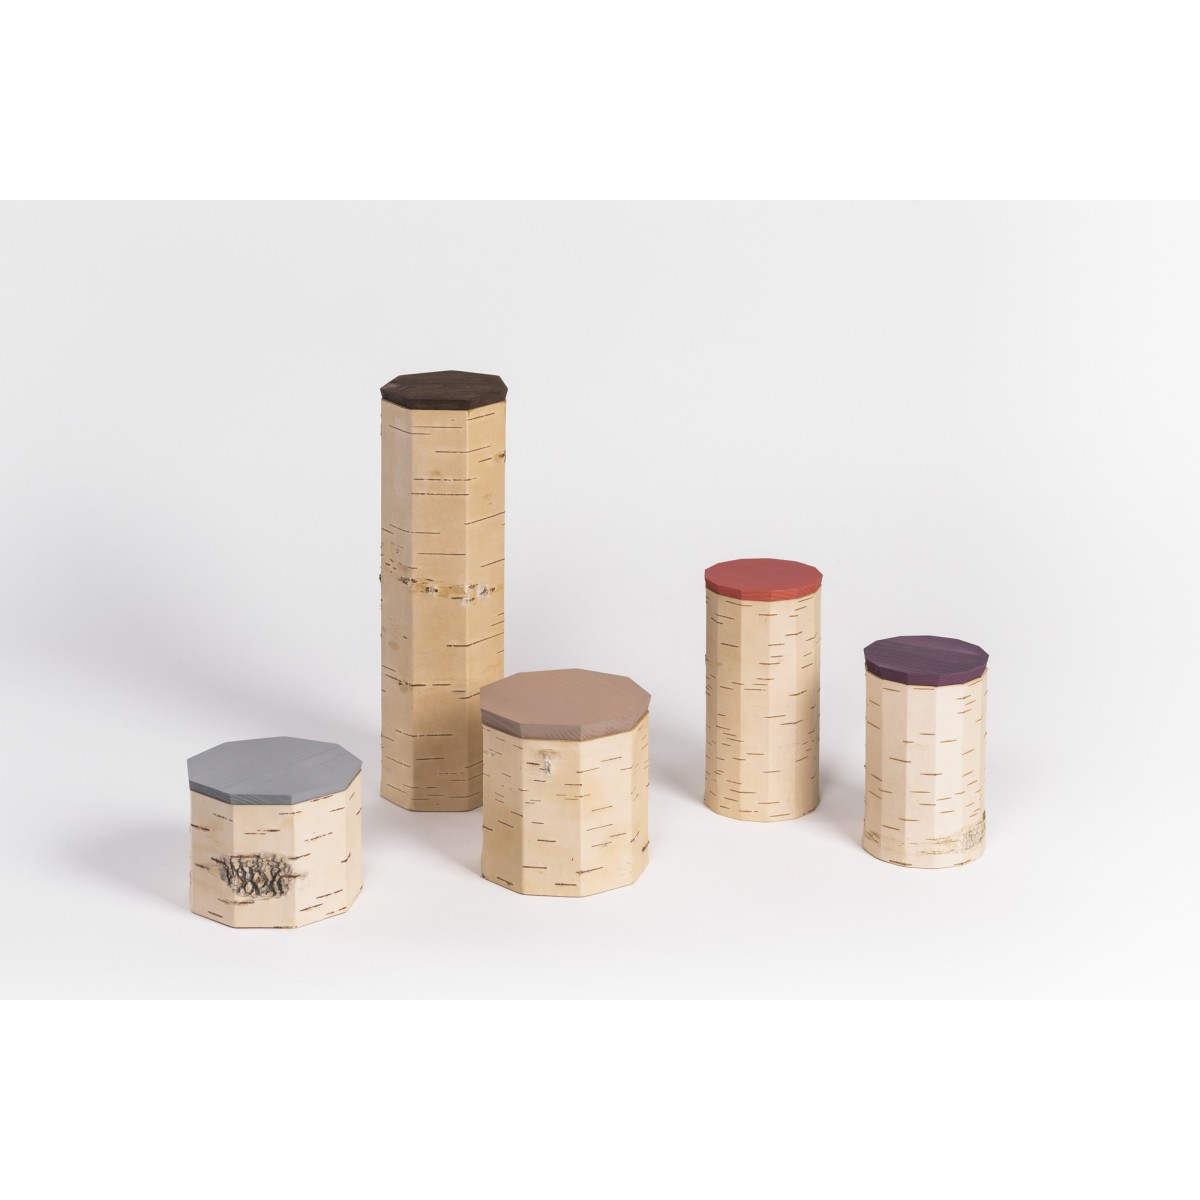 MOYA Nachhaltige Vorratsdose aus Birkenrinde TUESA T 7 | plain edition